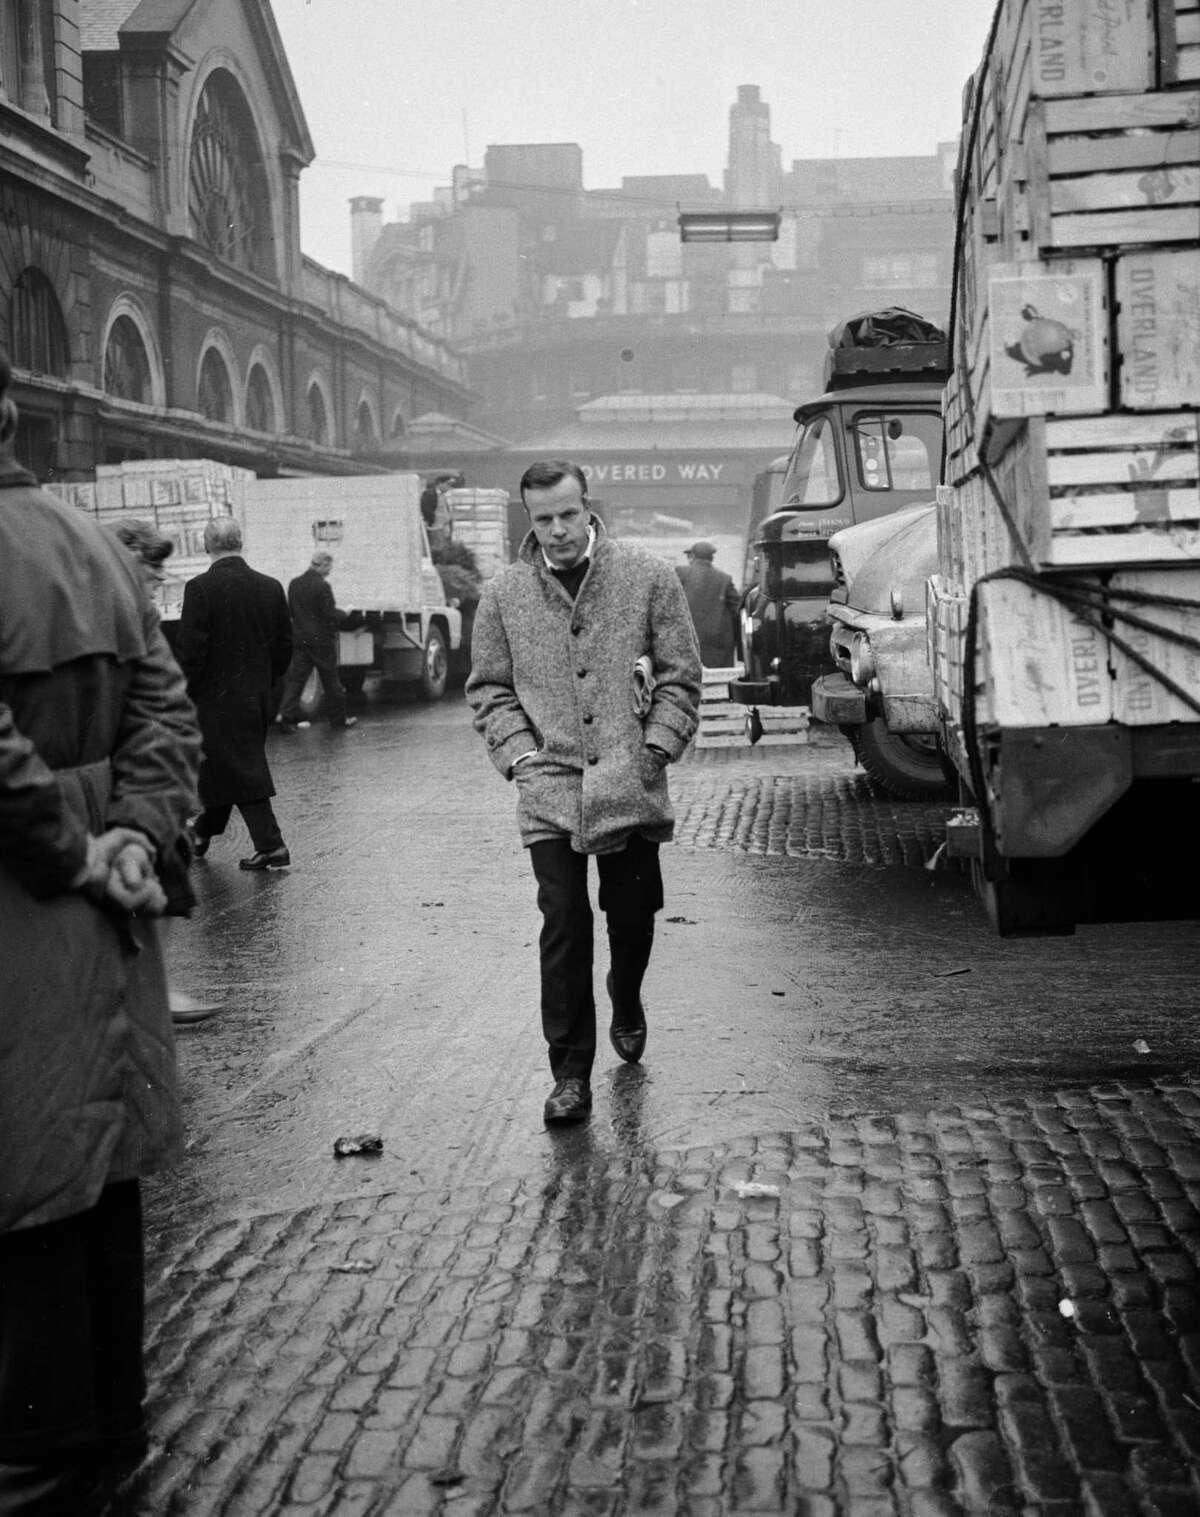 Italian conductor and film director Franco Zeffirelli, walking alone through Covent Garden market in London, January, 1964.